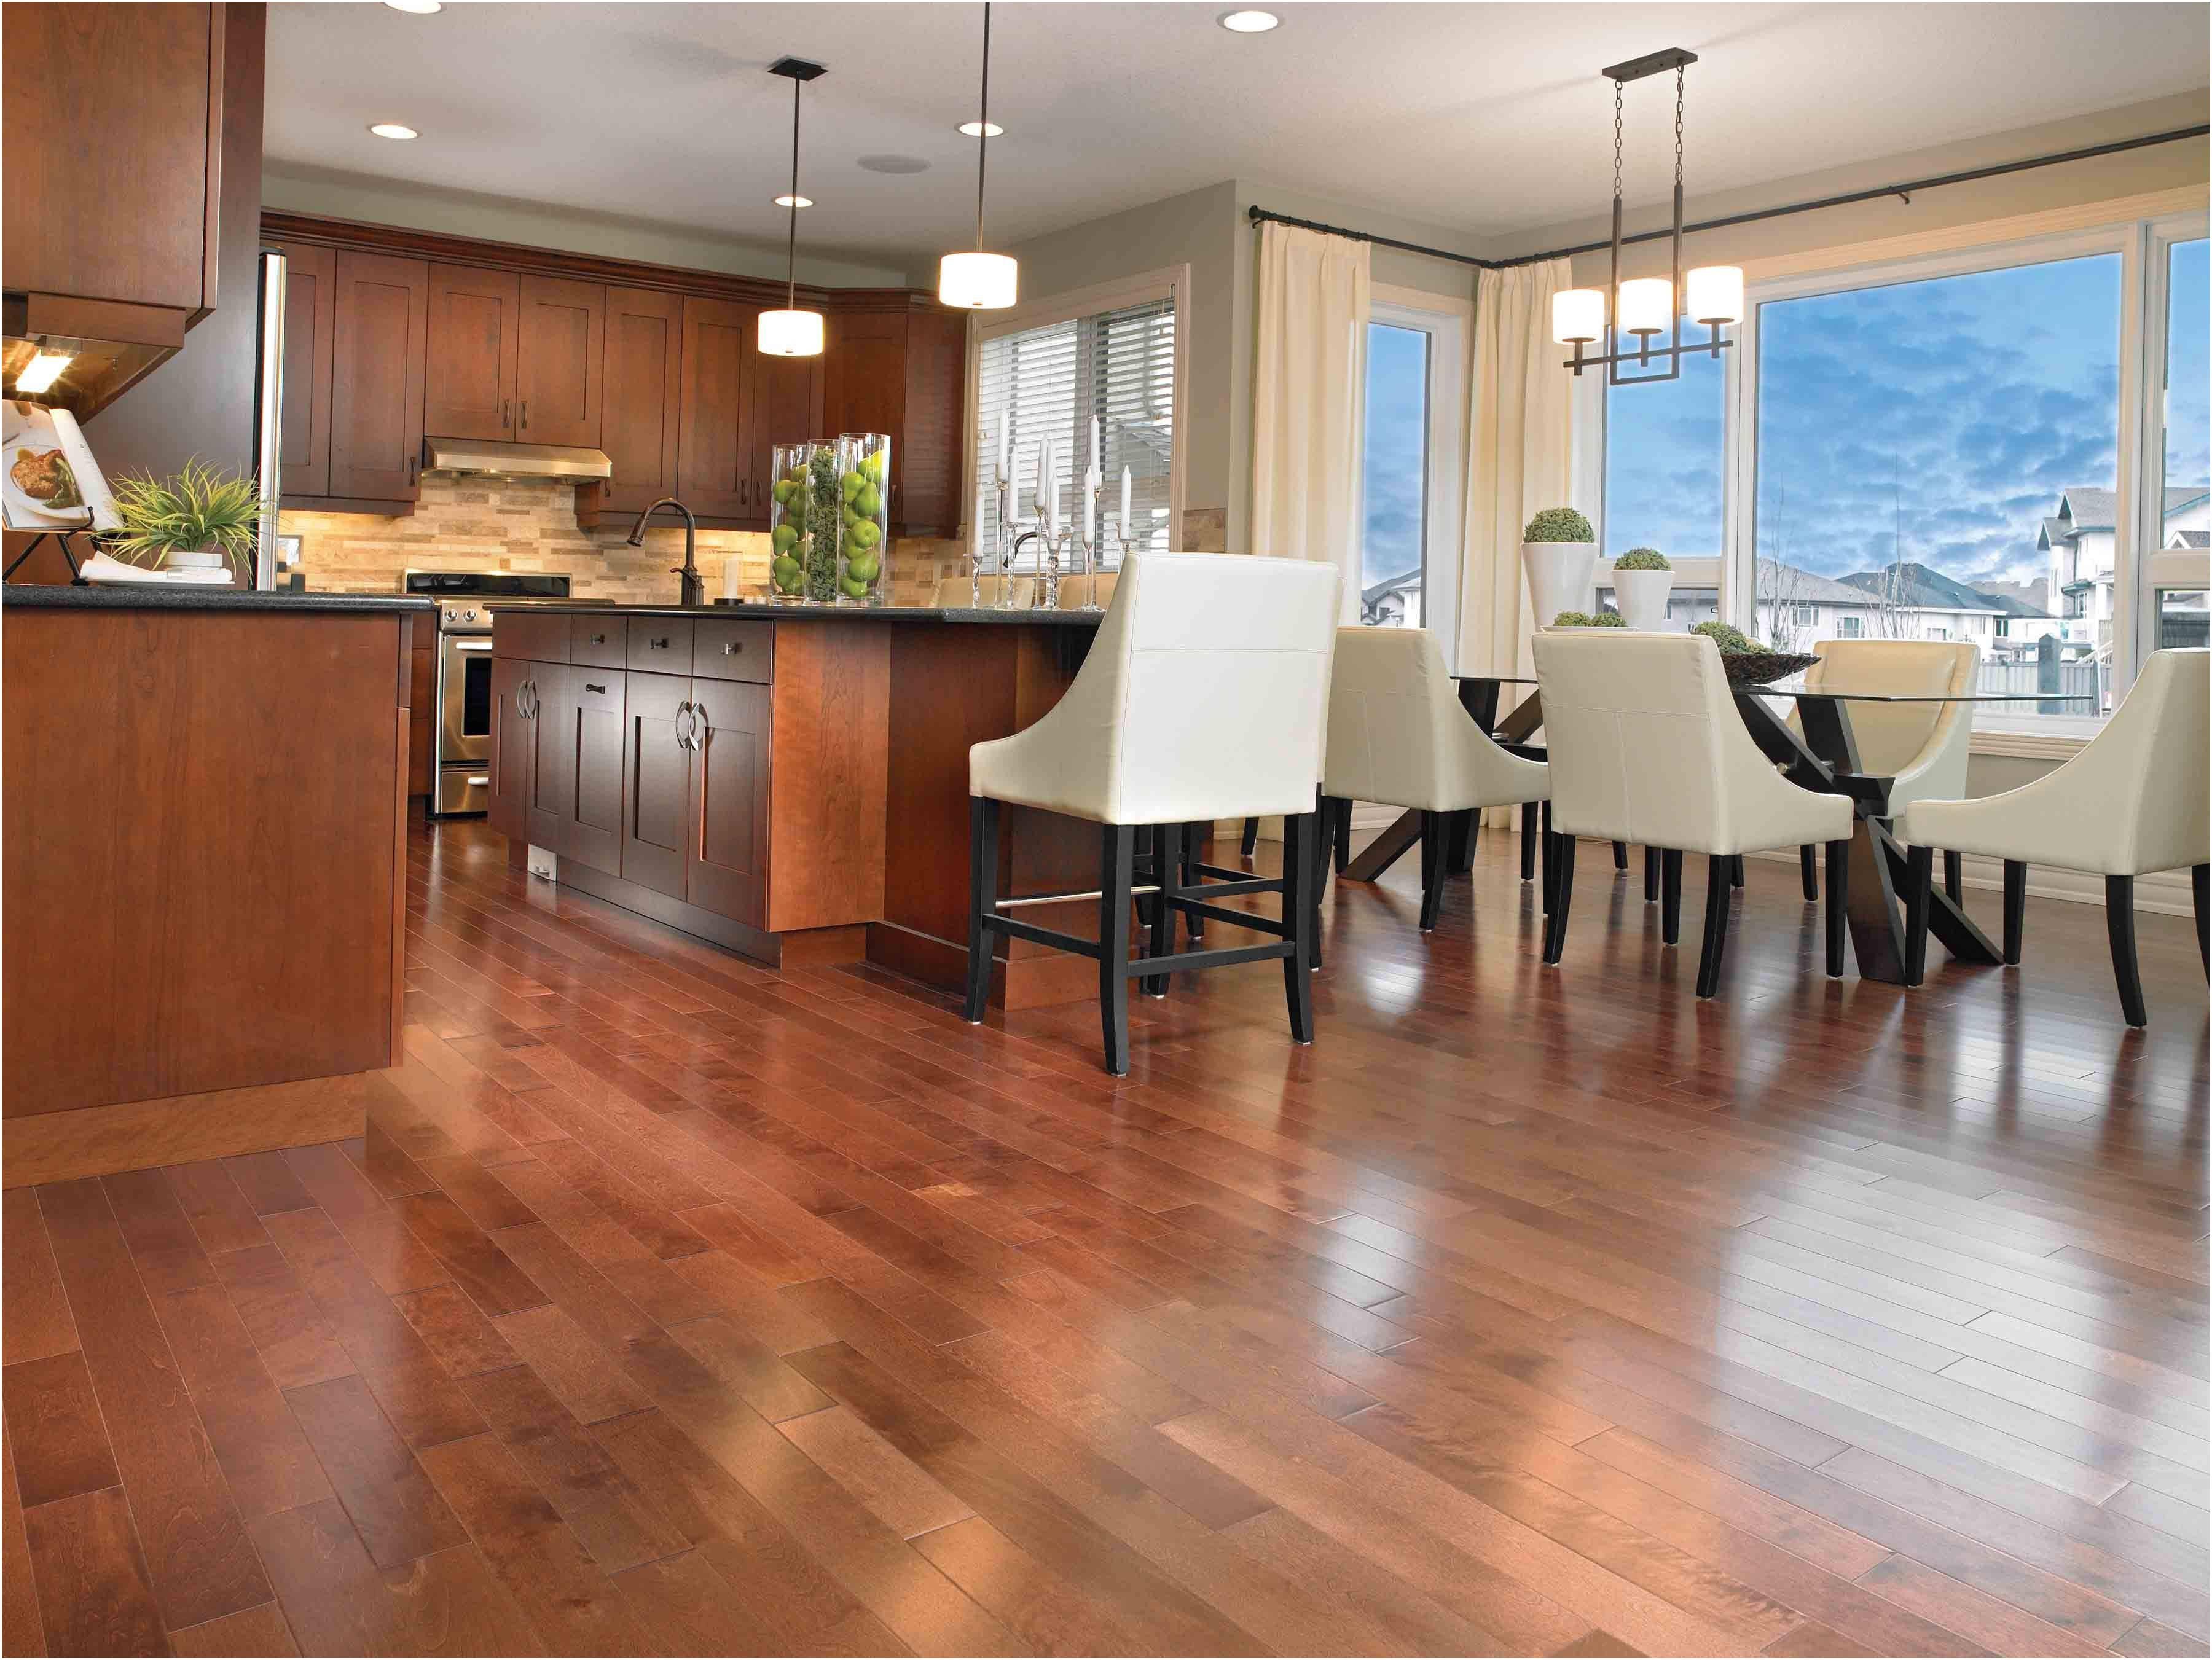 cheap hardwood flooring ideas of furniture on wood floors 40 best place to buy wood flooring ideas regarding furniture on wood floors flooring nj furniture design hard wood flooring new 0d grace place